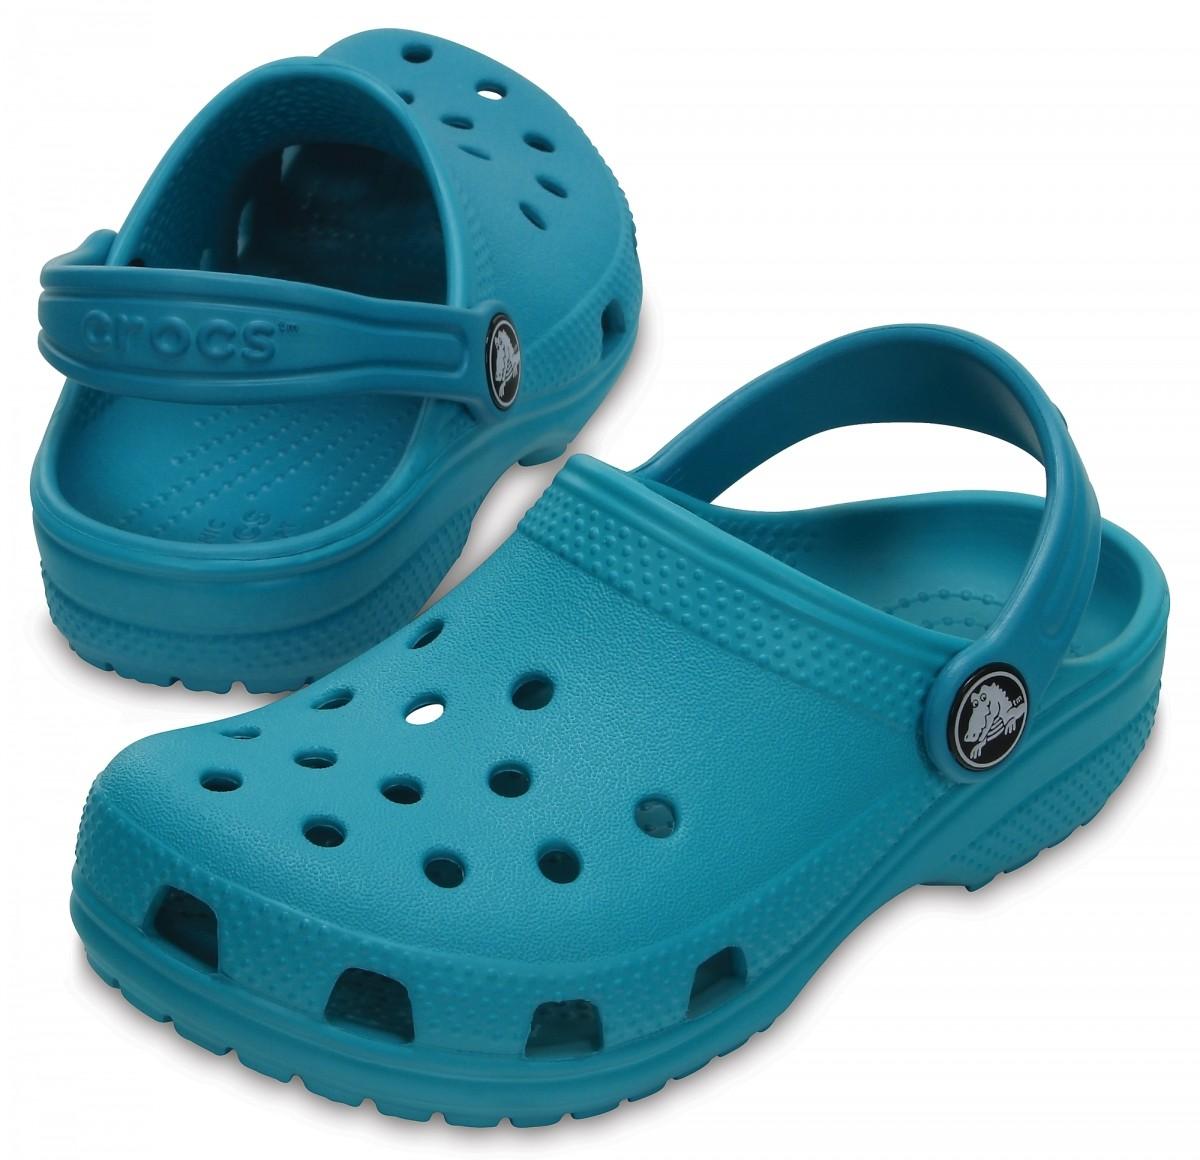 62e5ab02b02 Pantofle (nazouváky) Crocs Classic Clog Kids - Turquoise